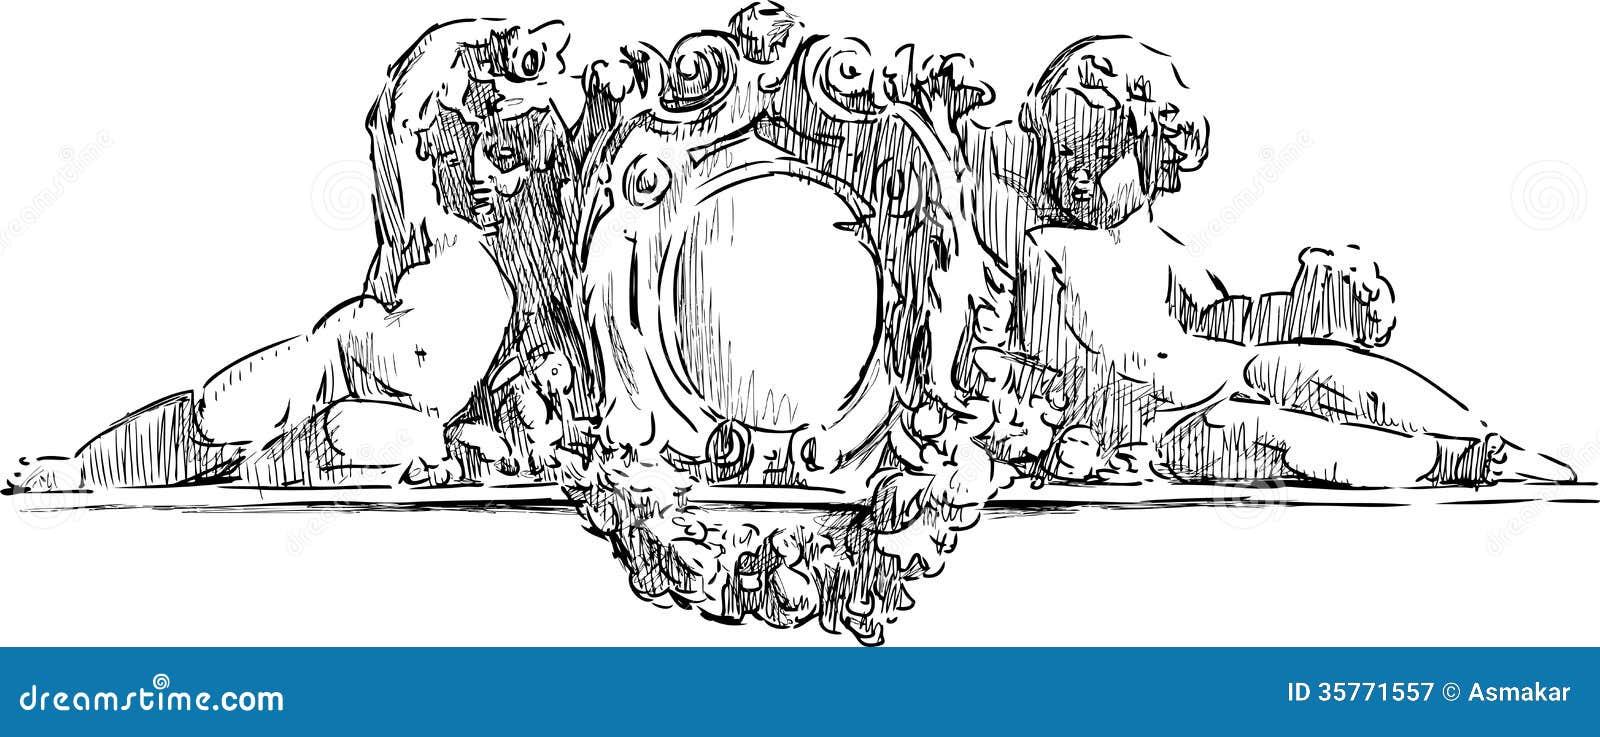 Architecturaal detail met engelen